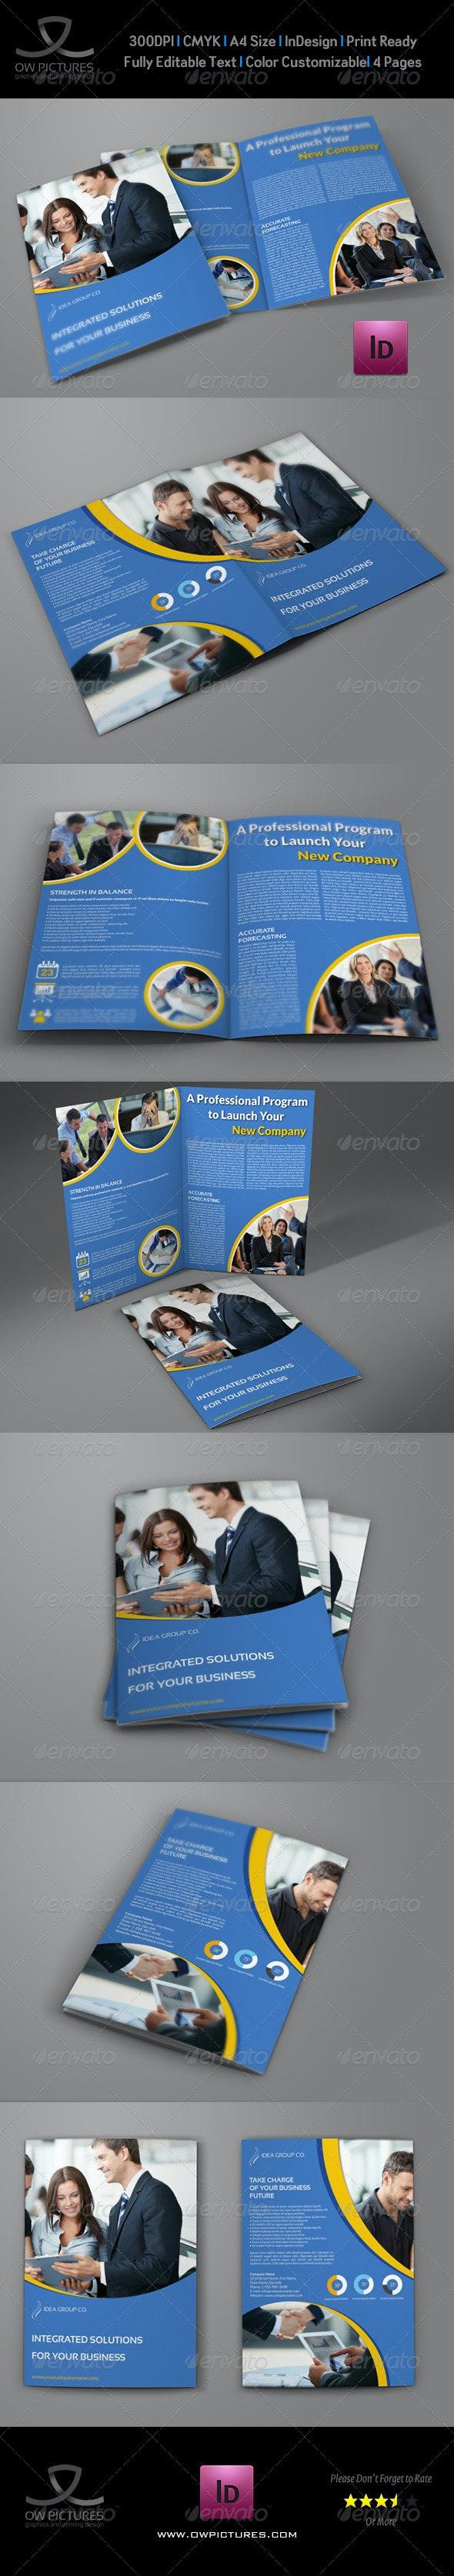 Company Brochure Bi-Fold Template Vol.29 - Corporate Brochures